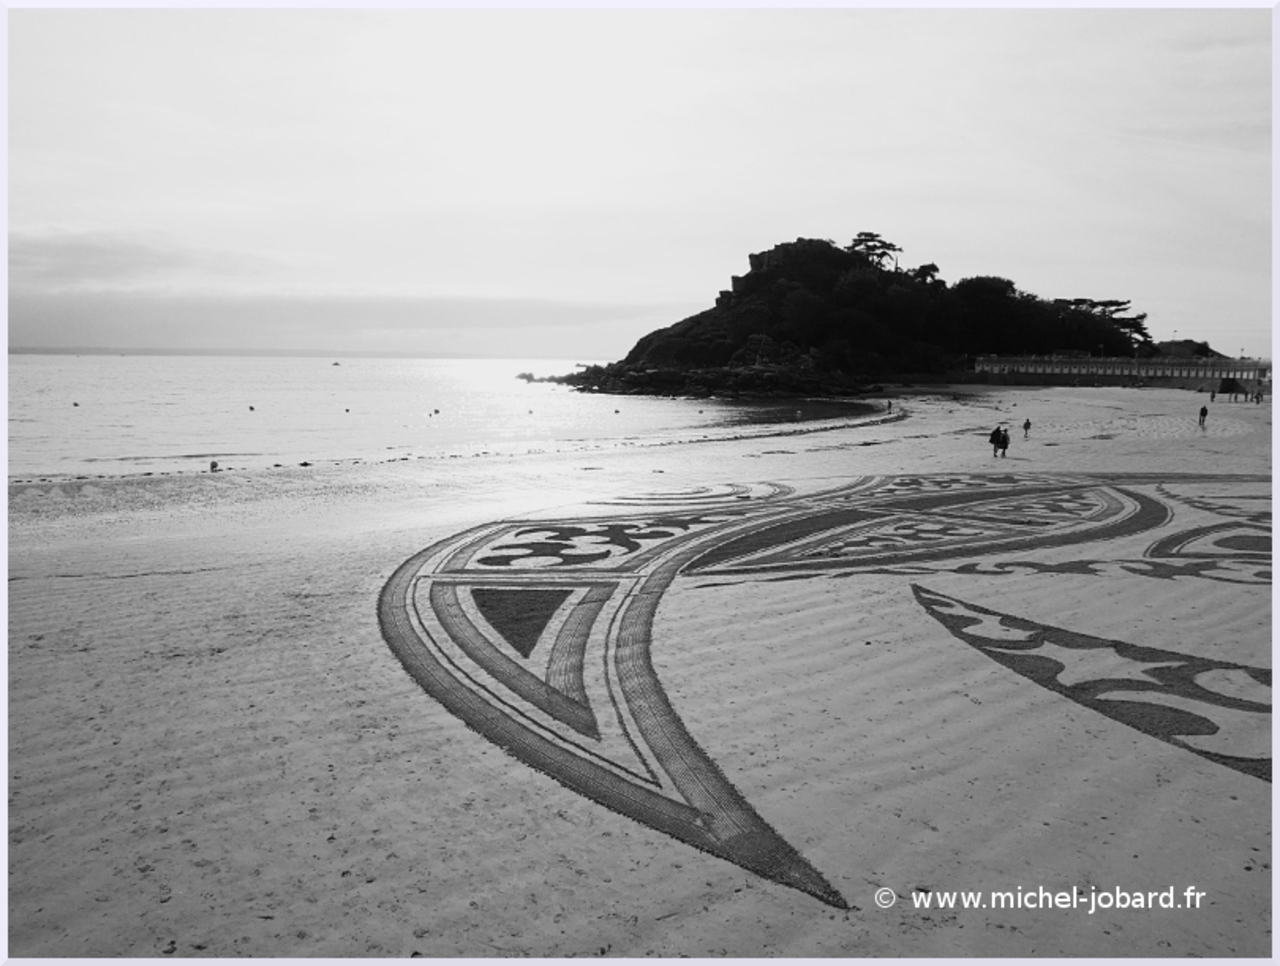 beach-art-celtitude-19-septembre-2016-04